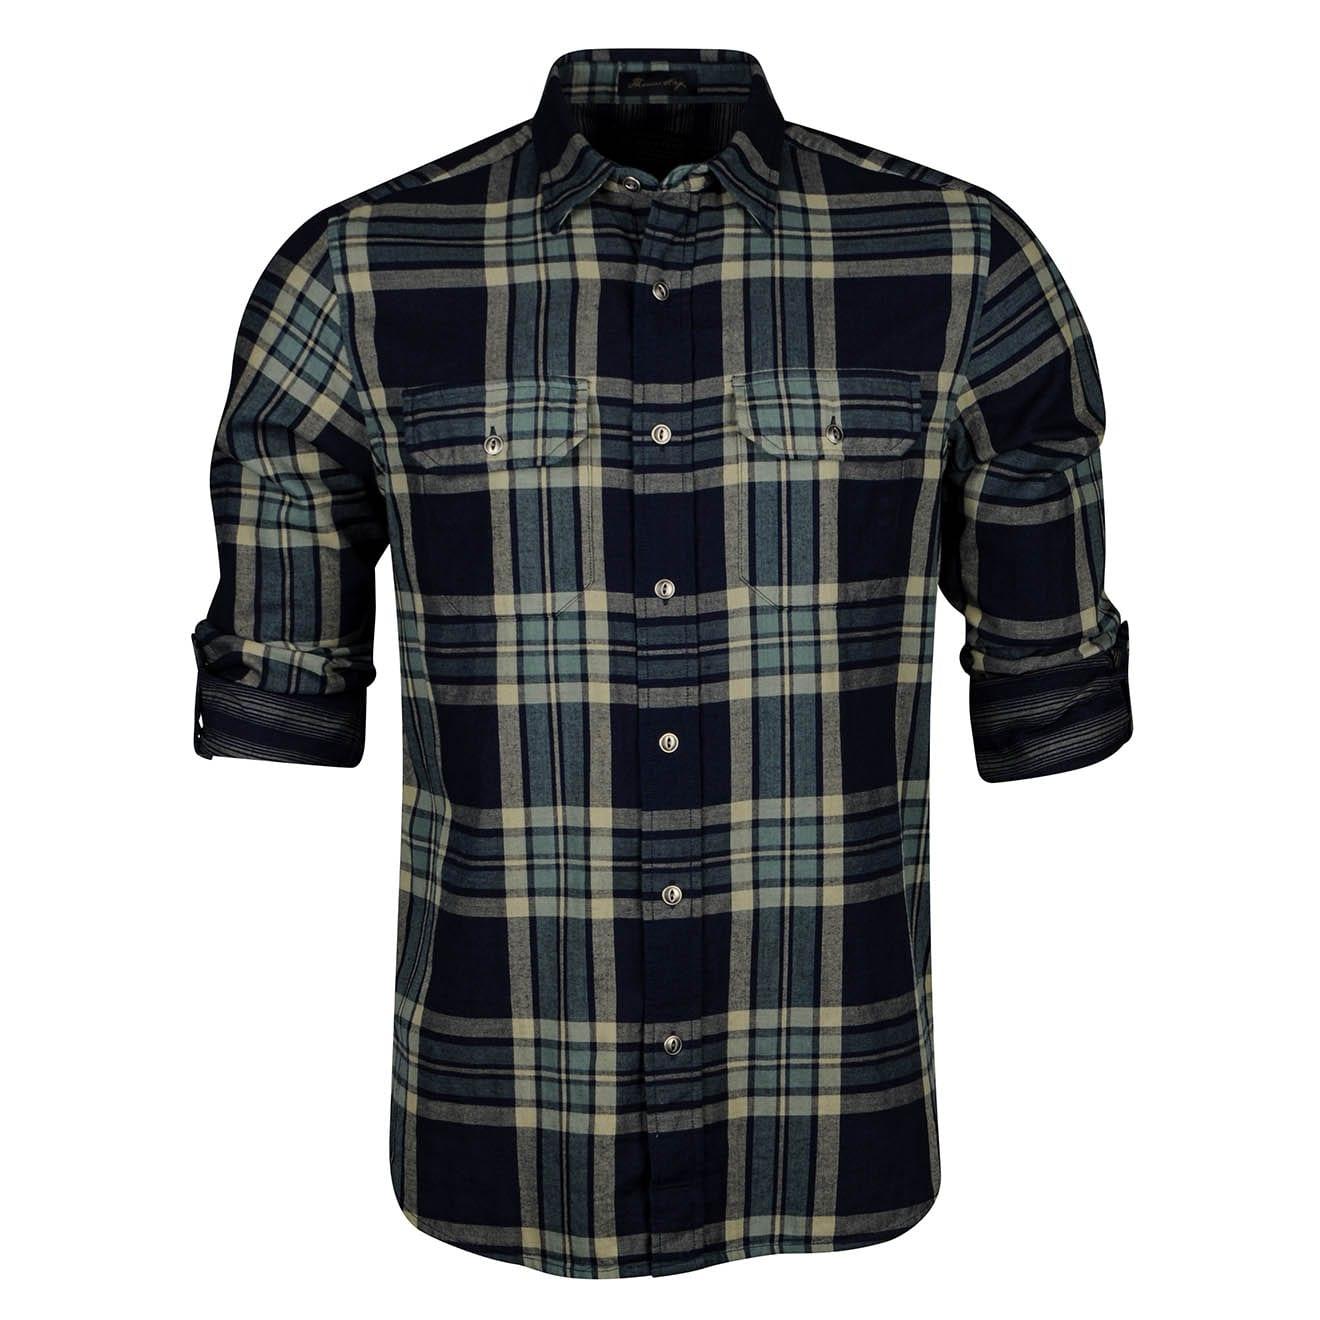 Pendleton Thomas Kay Double Face Fitted Shirt Indigo Plaid